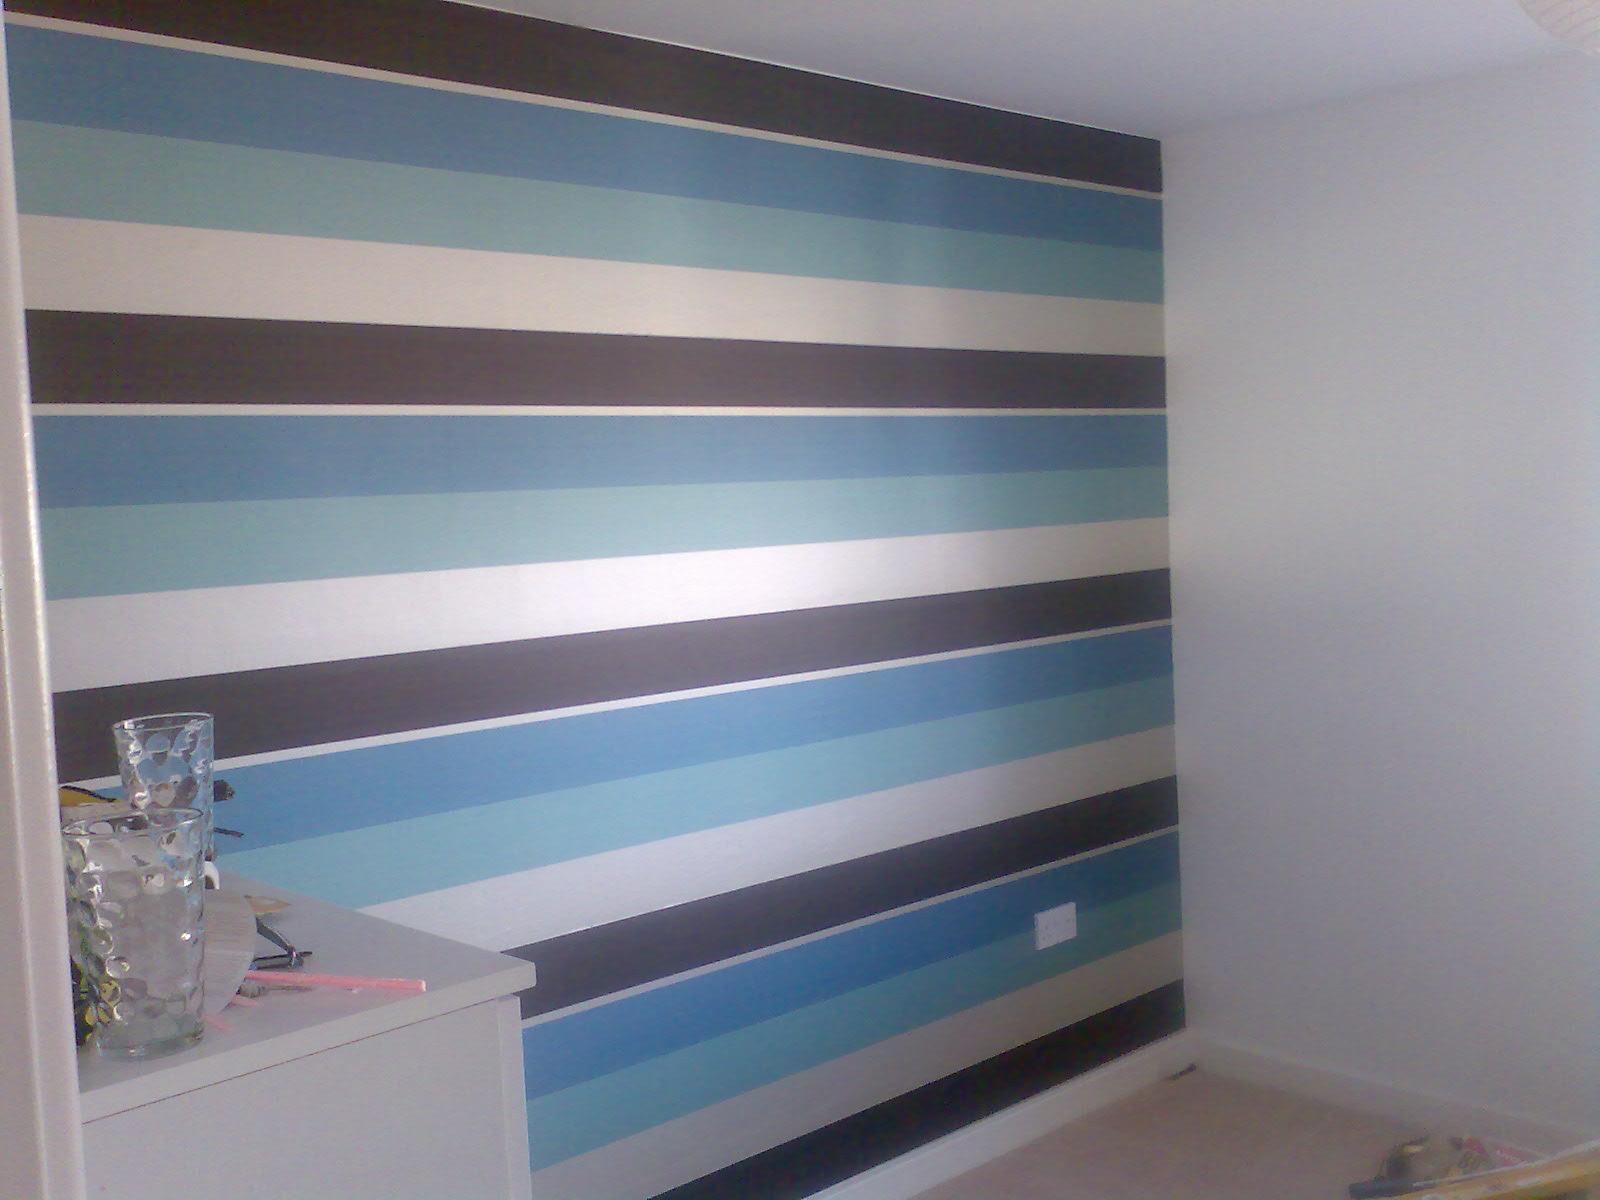 Exclusive horizontal wallpaper in a bedroom in Northampton Painters 1600x1200